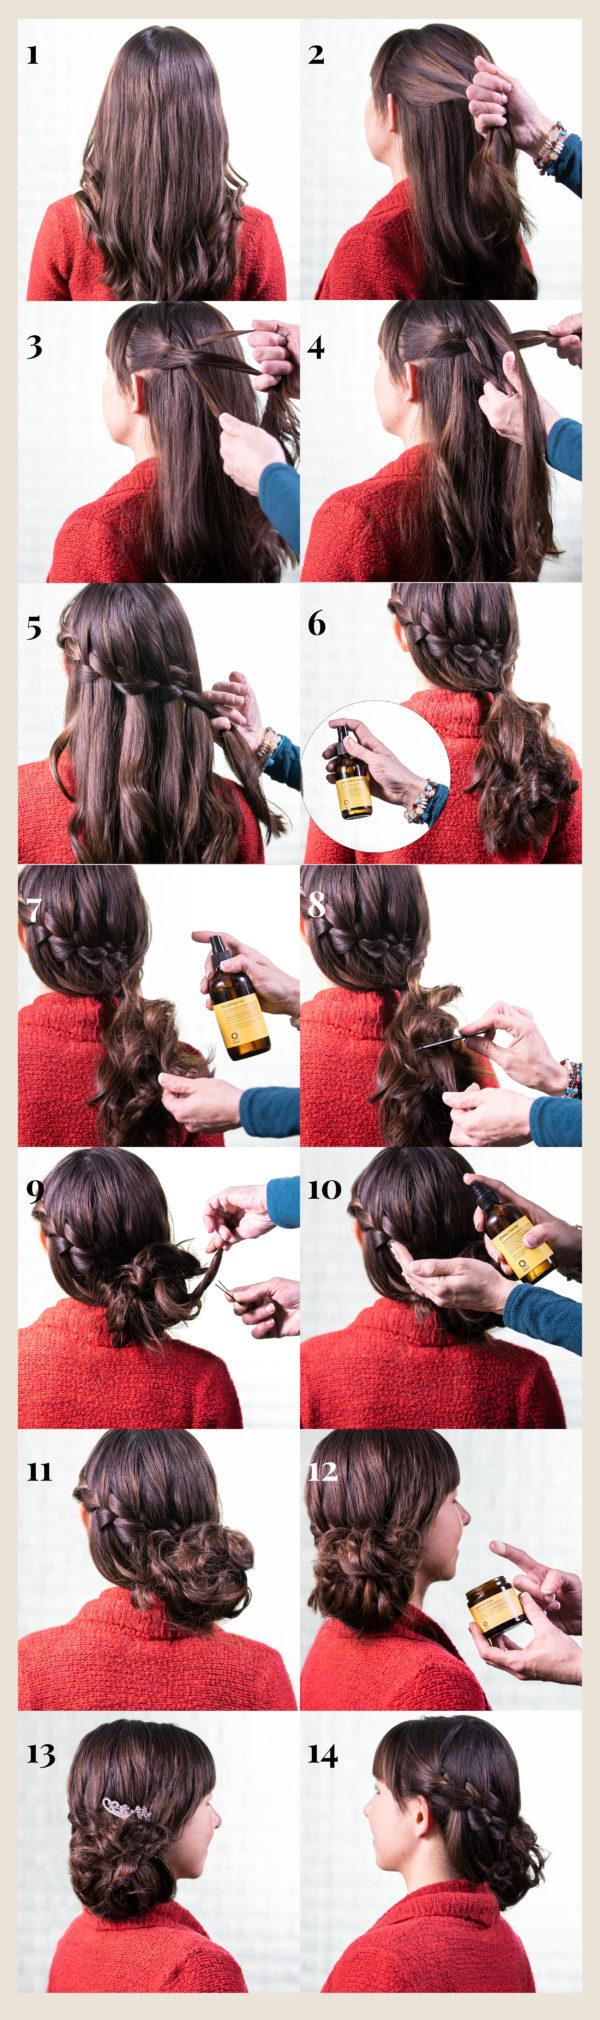 Elegant Hairstyle Tutorials Which Will Amaze You